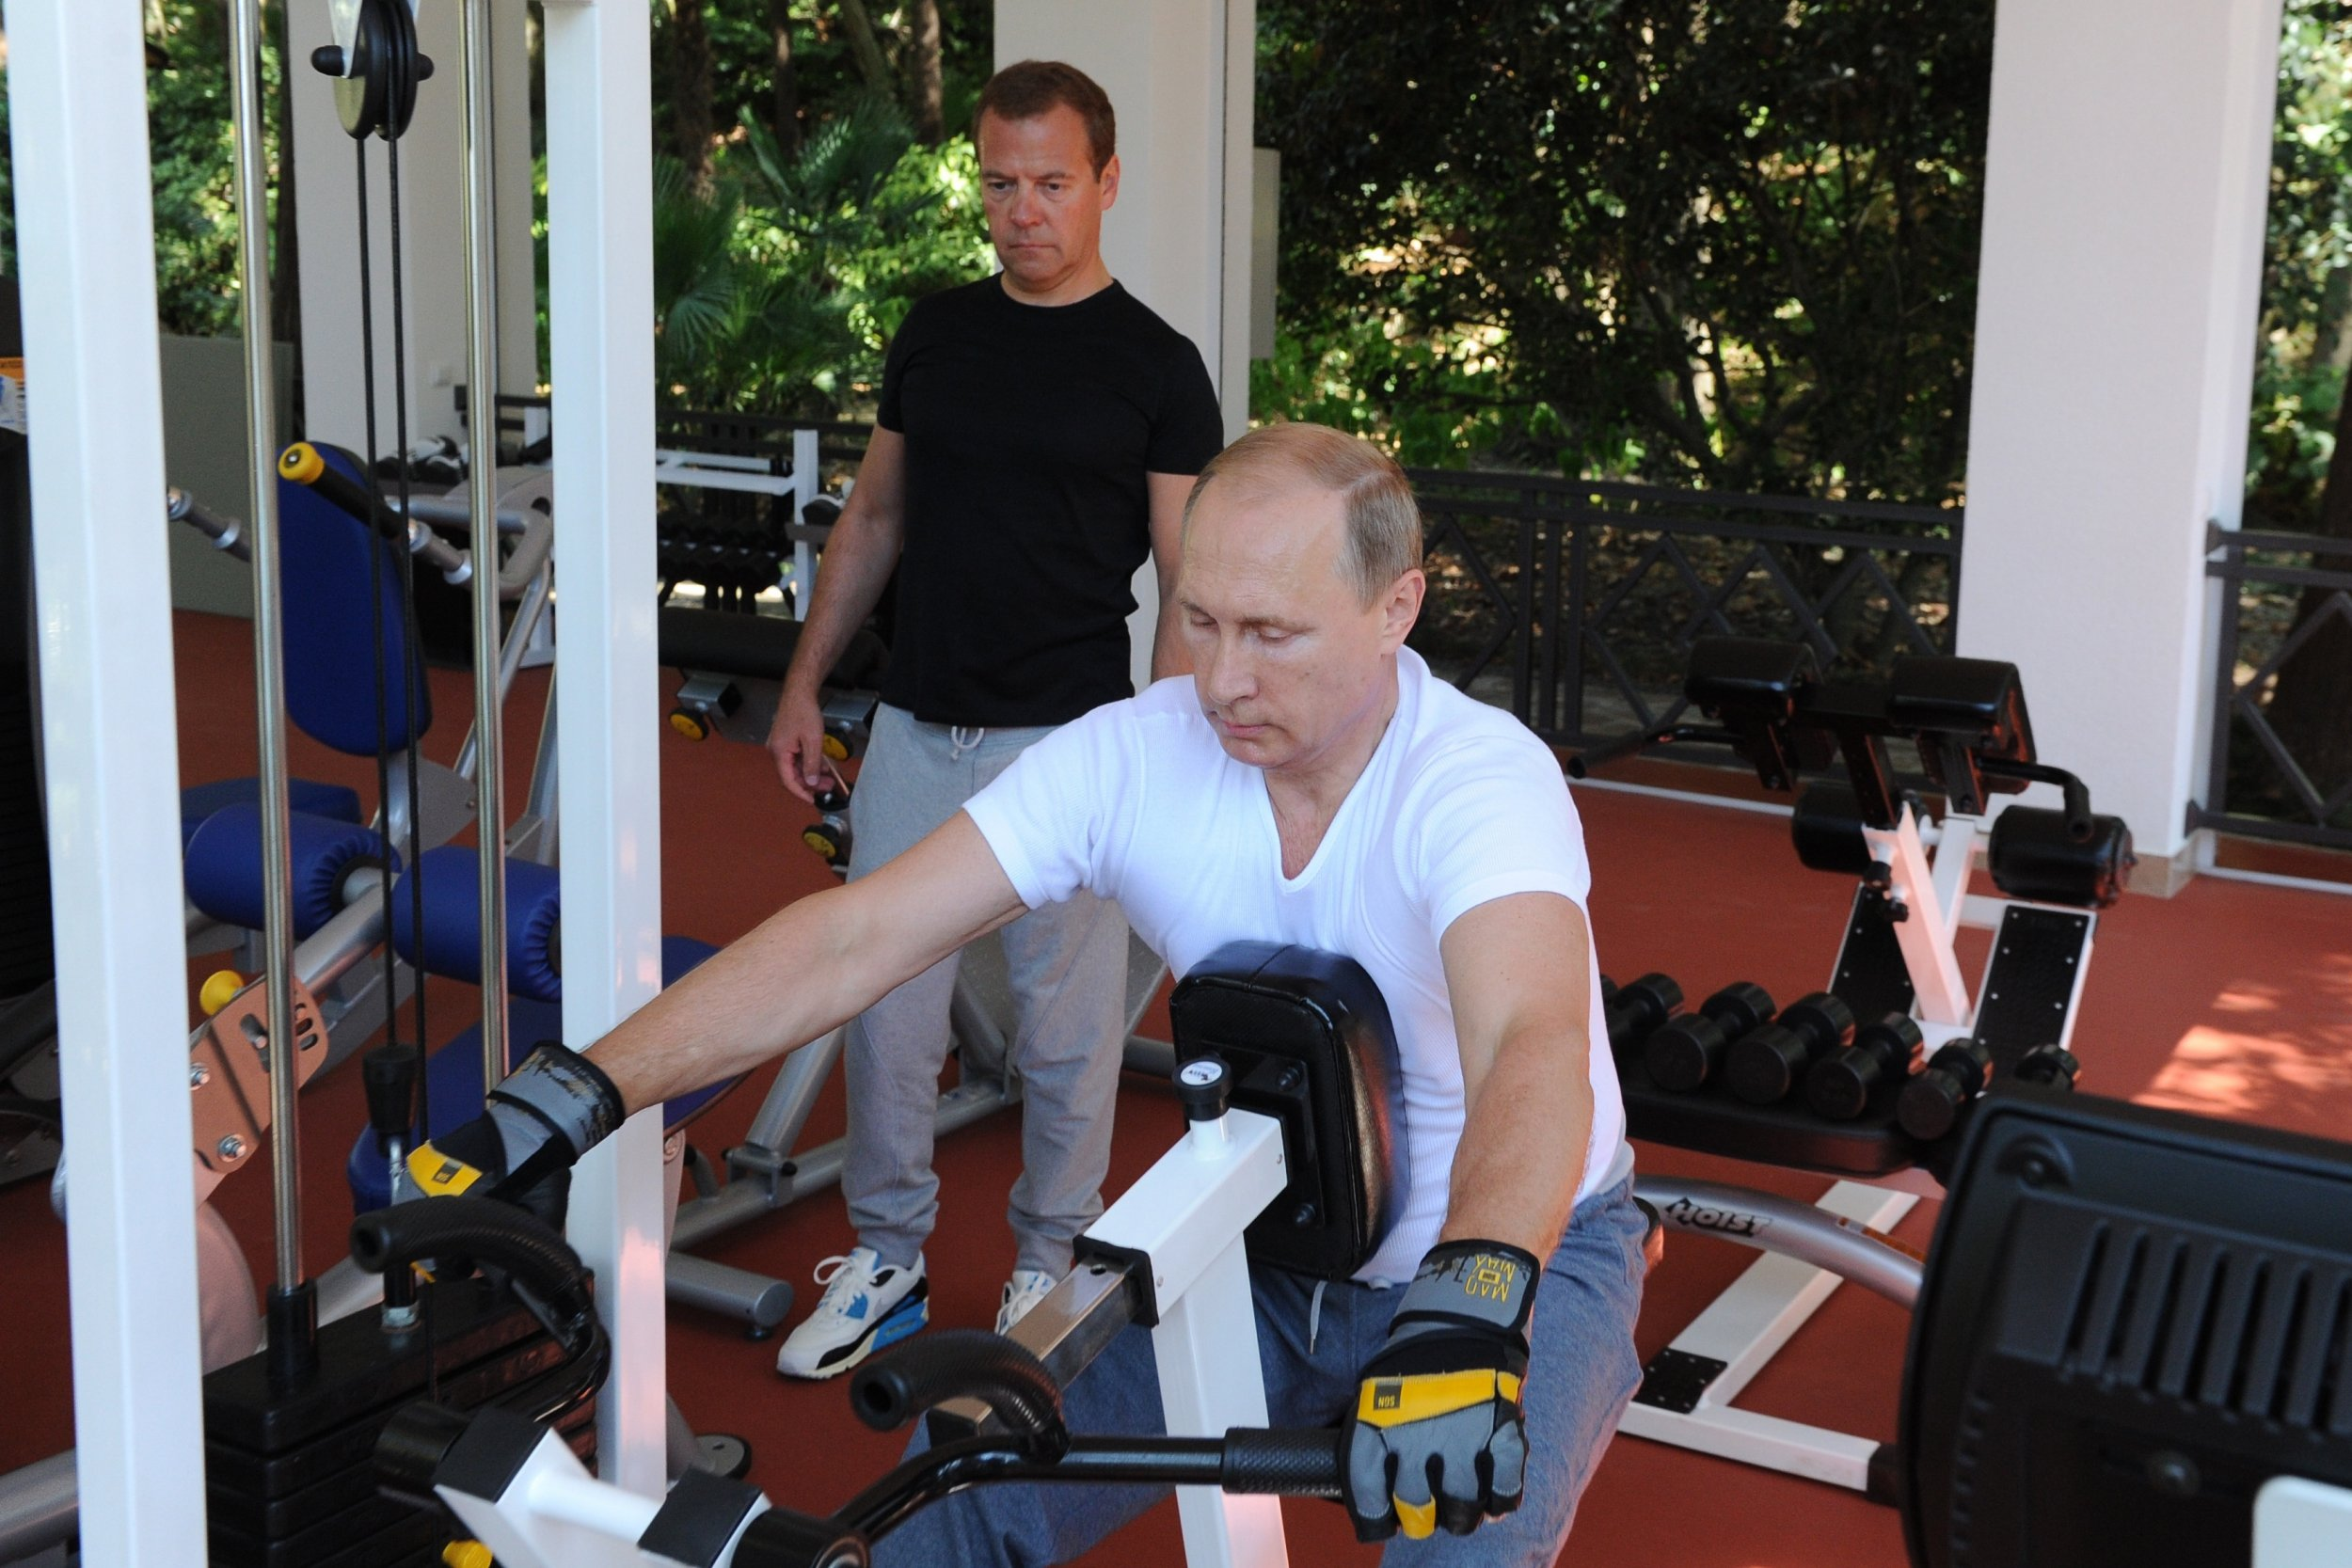 01_17_Putin_gym